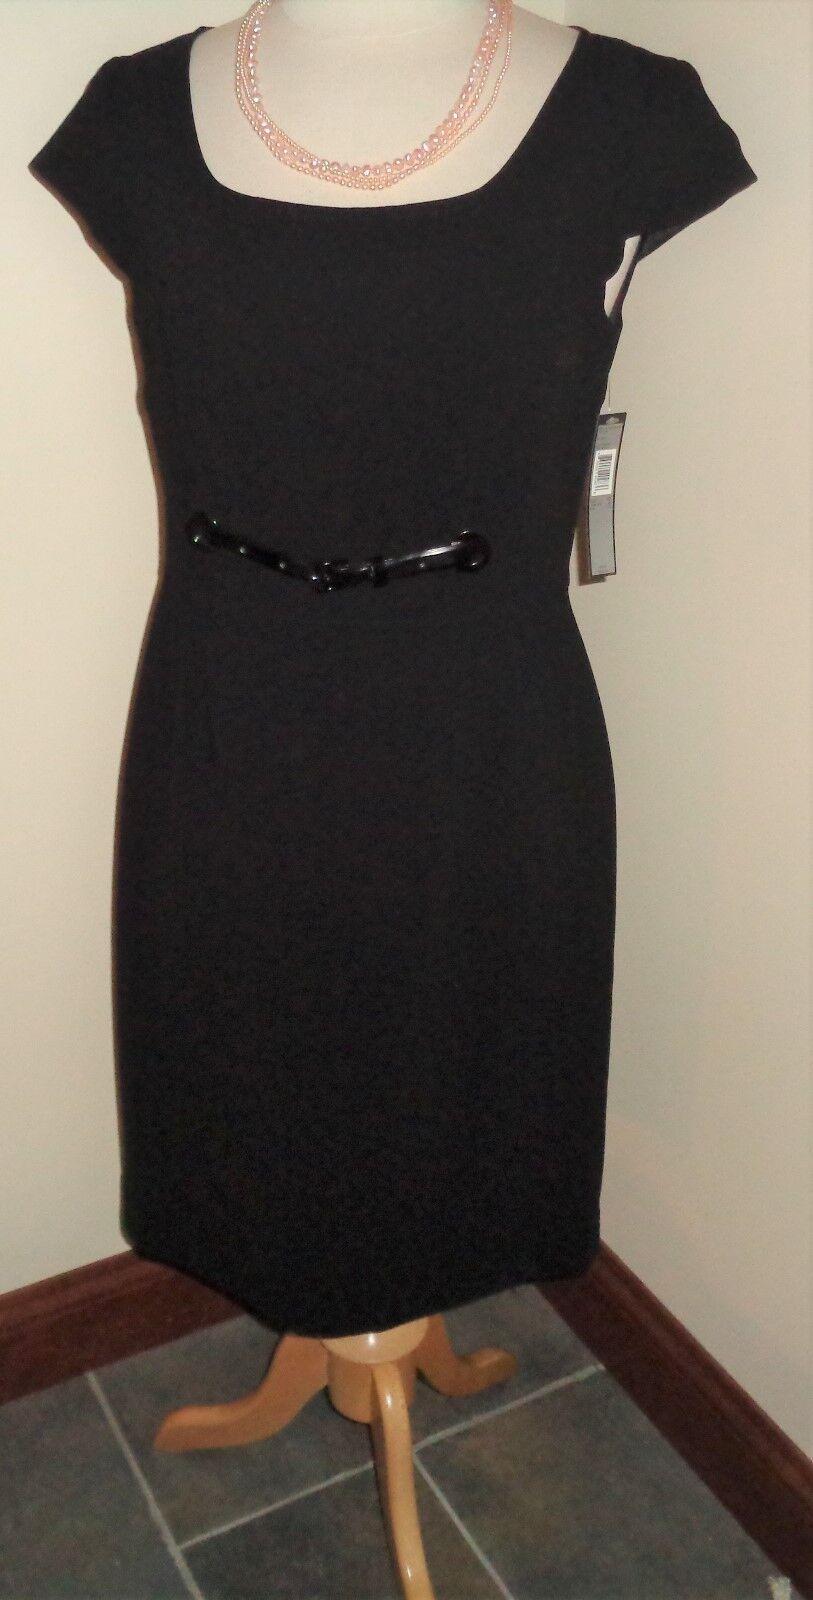 Tahari  schwarz Sheath Dress Größe 10 NWT Cap Sleeves